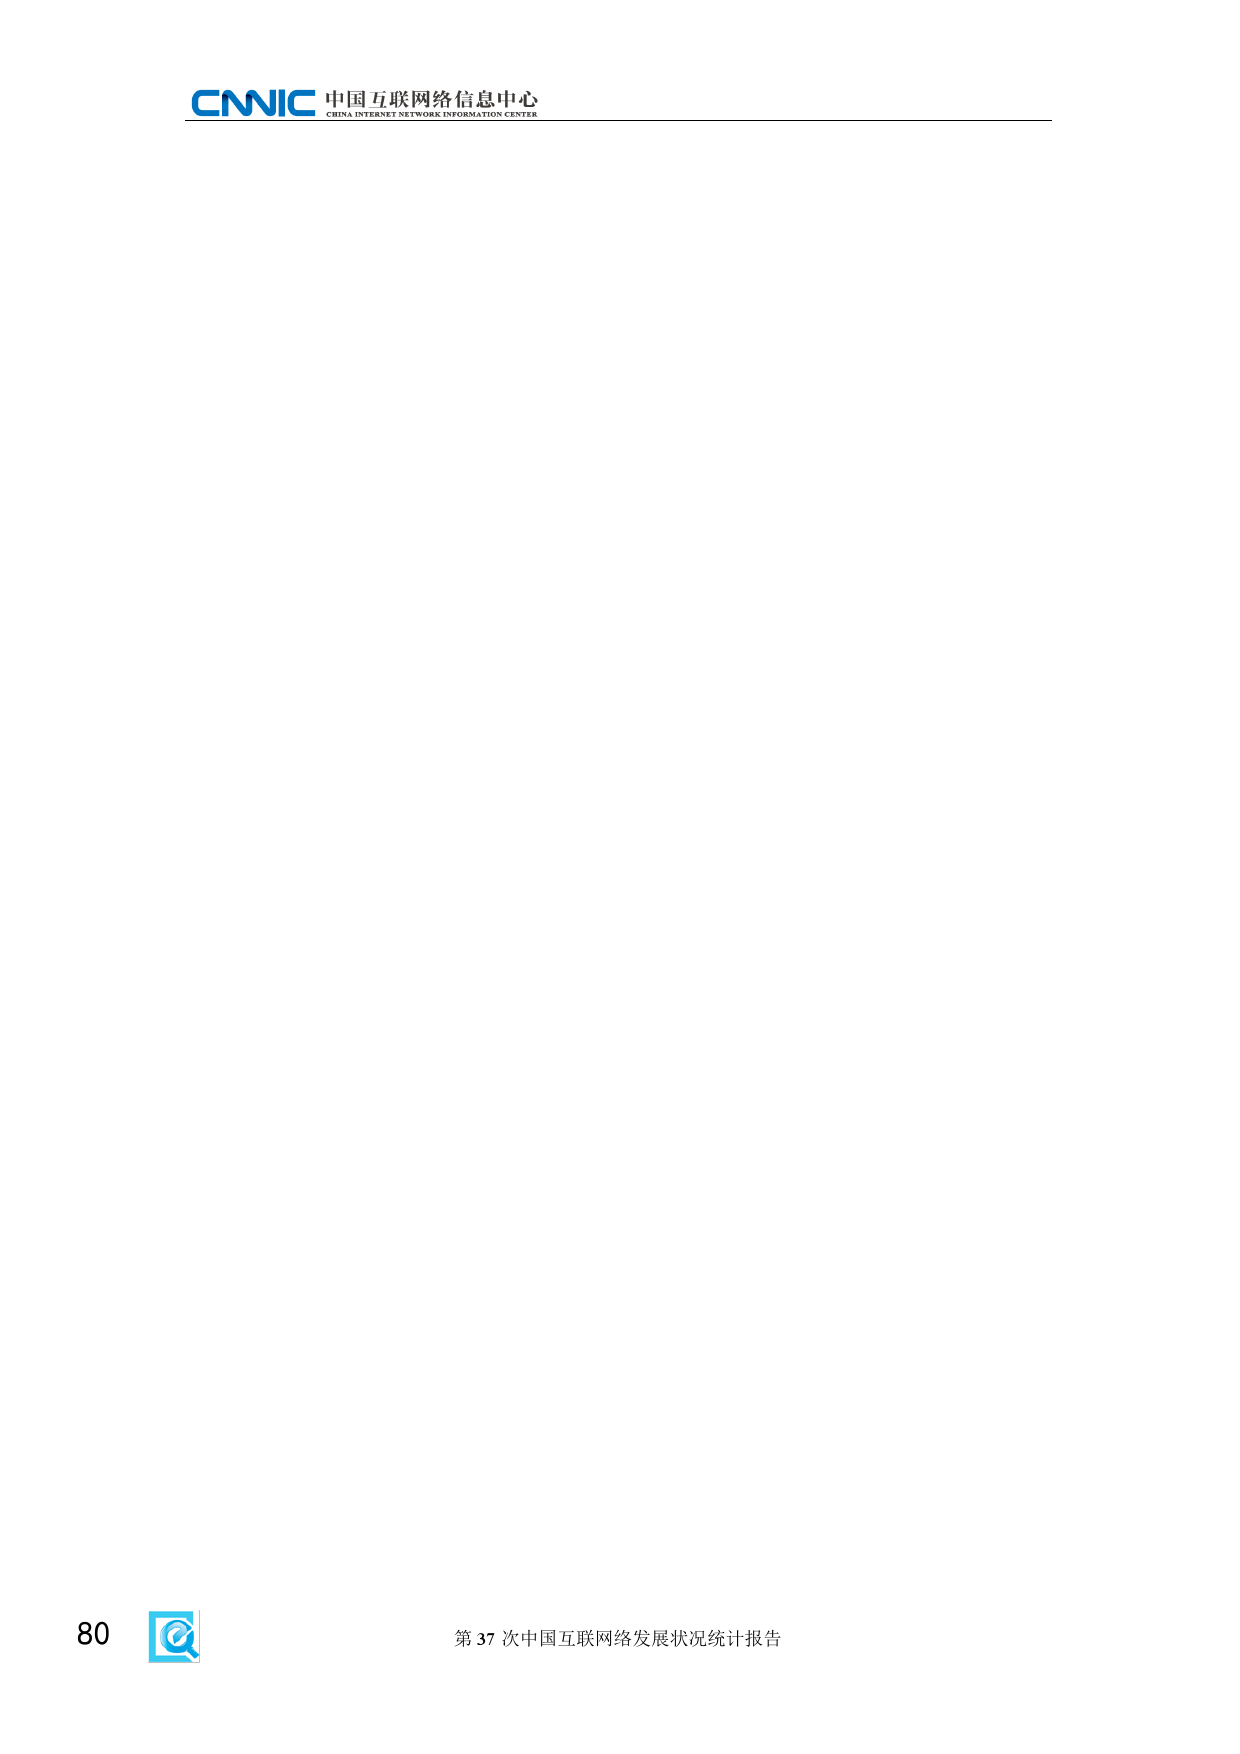 CNNIC:2015年第37次中国互联网络发展状况统计报告_000086